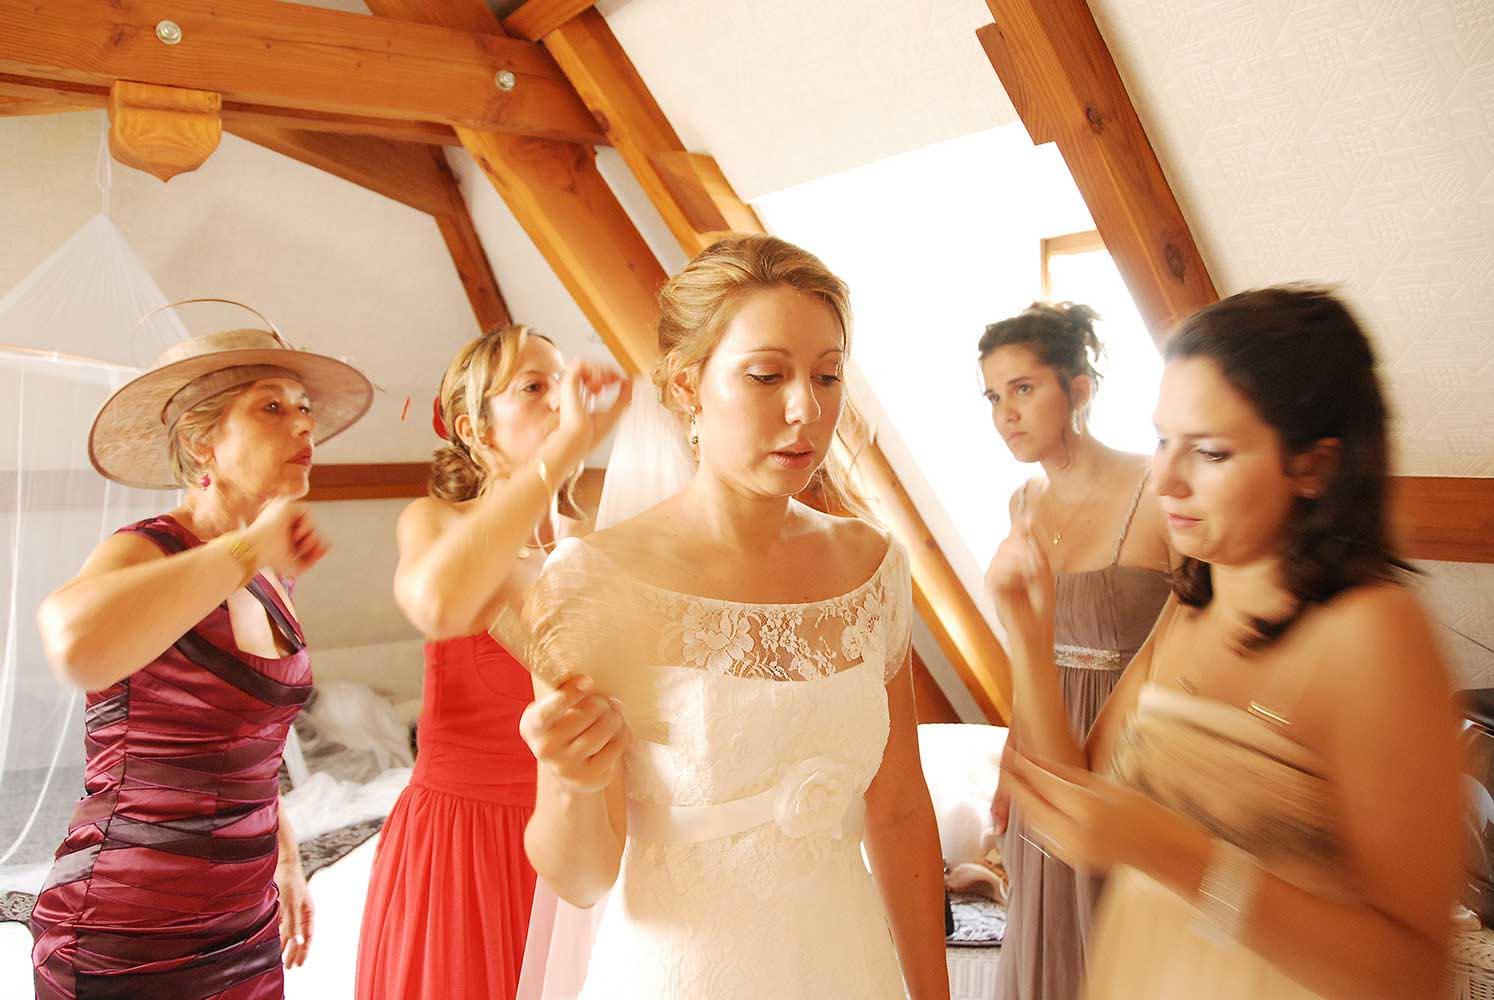 Bride getting dressed by wedding maids